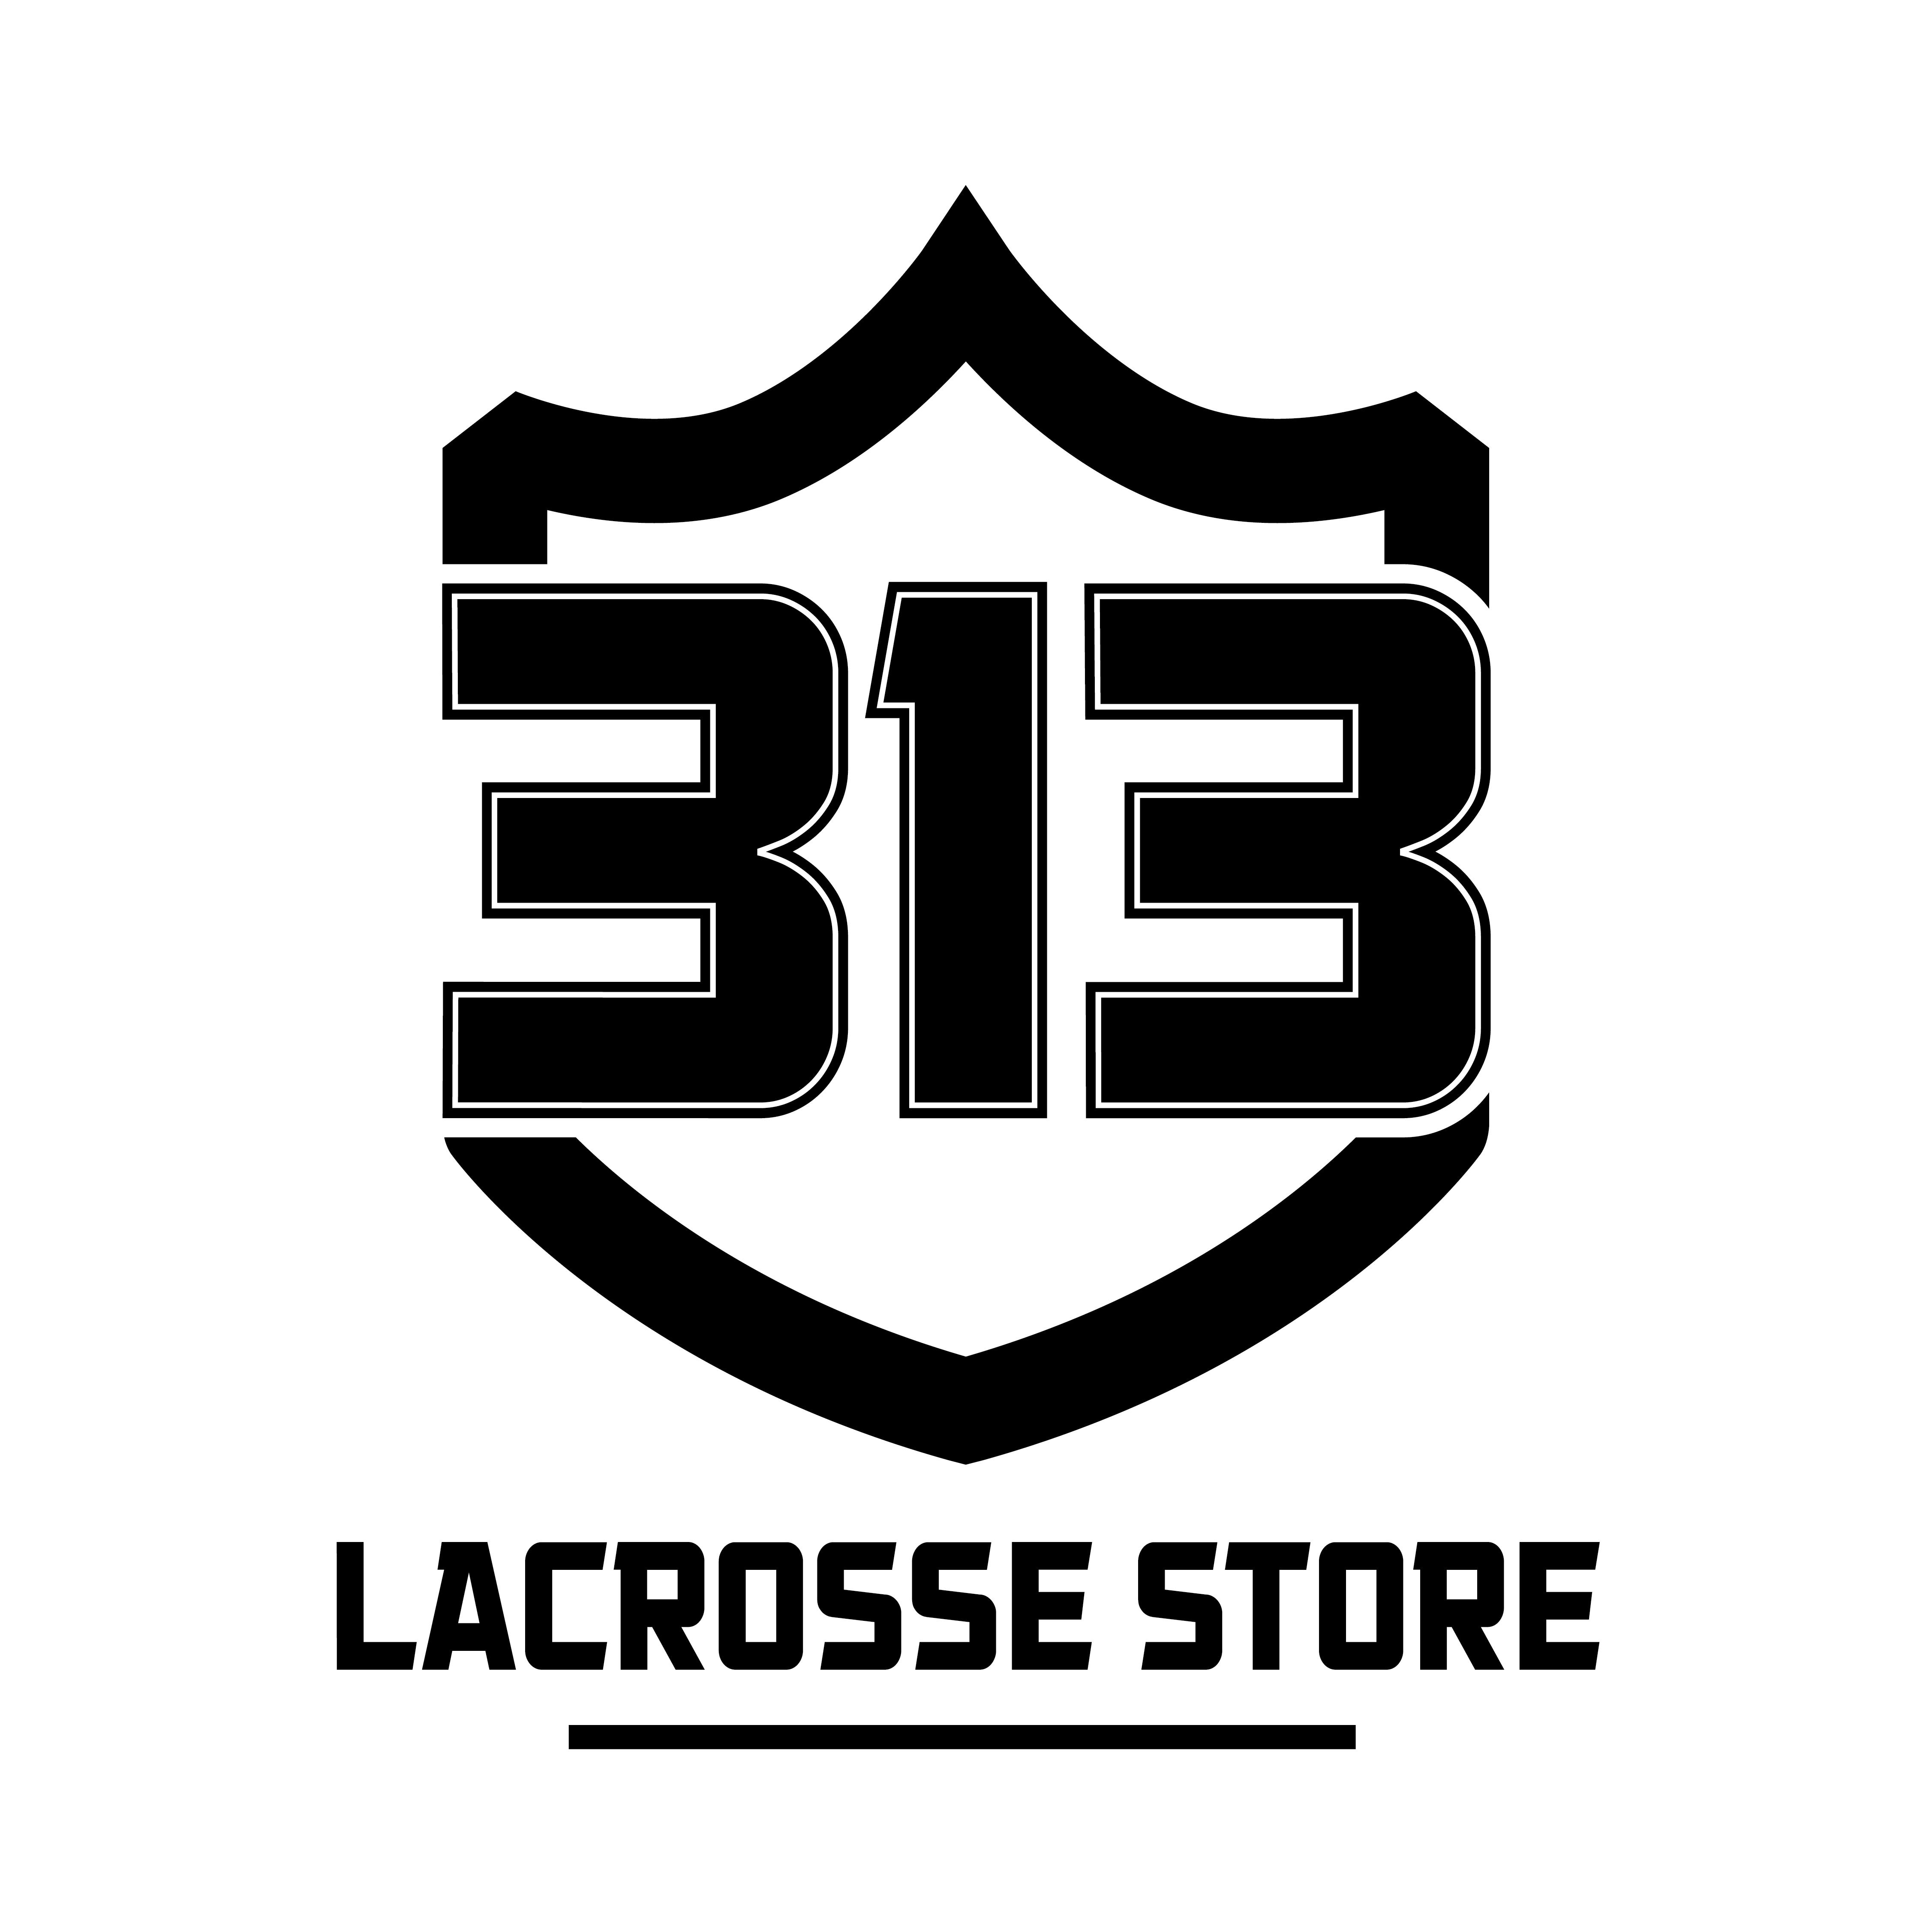 313 Lax Store